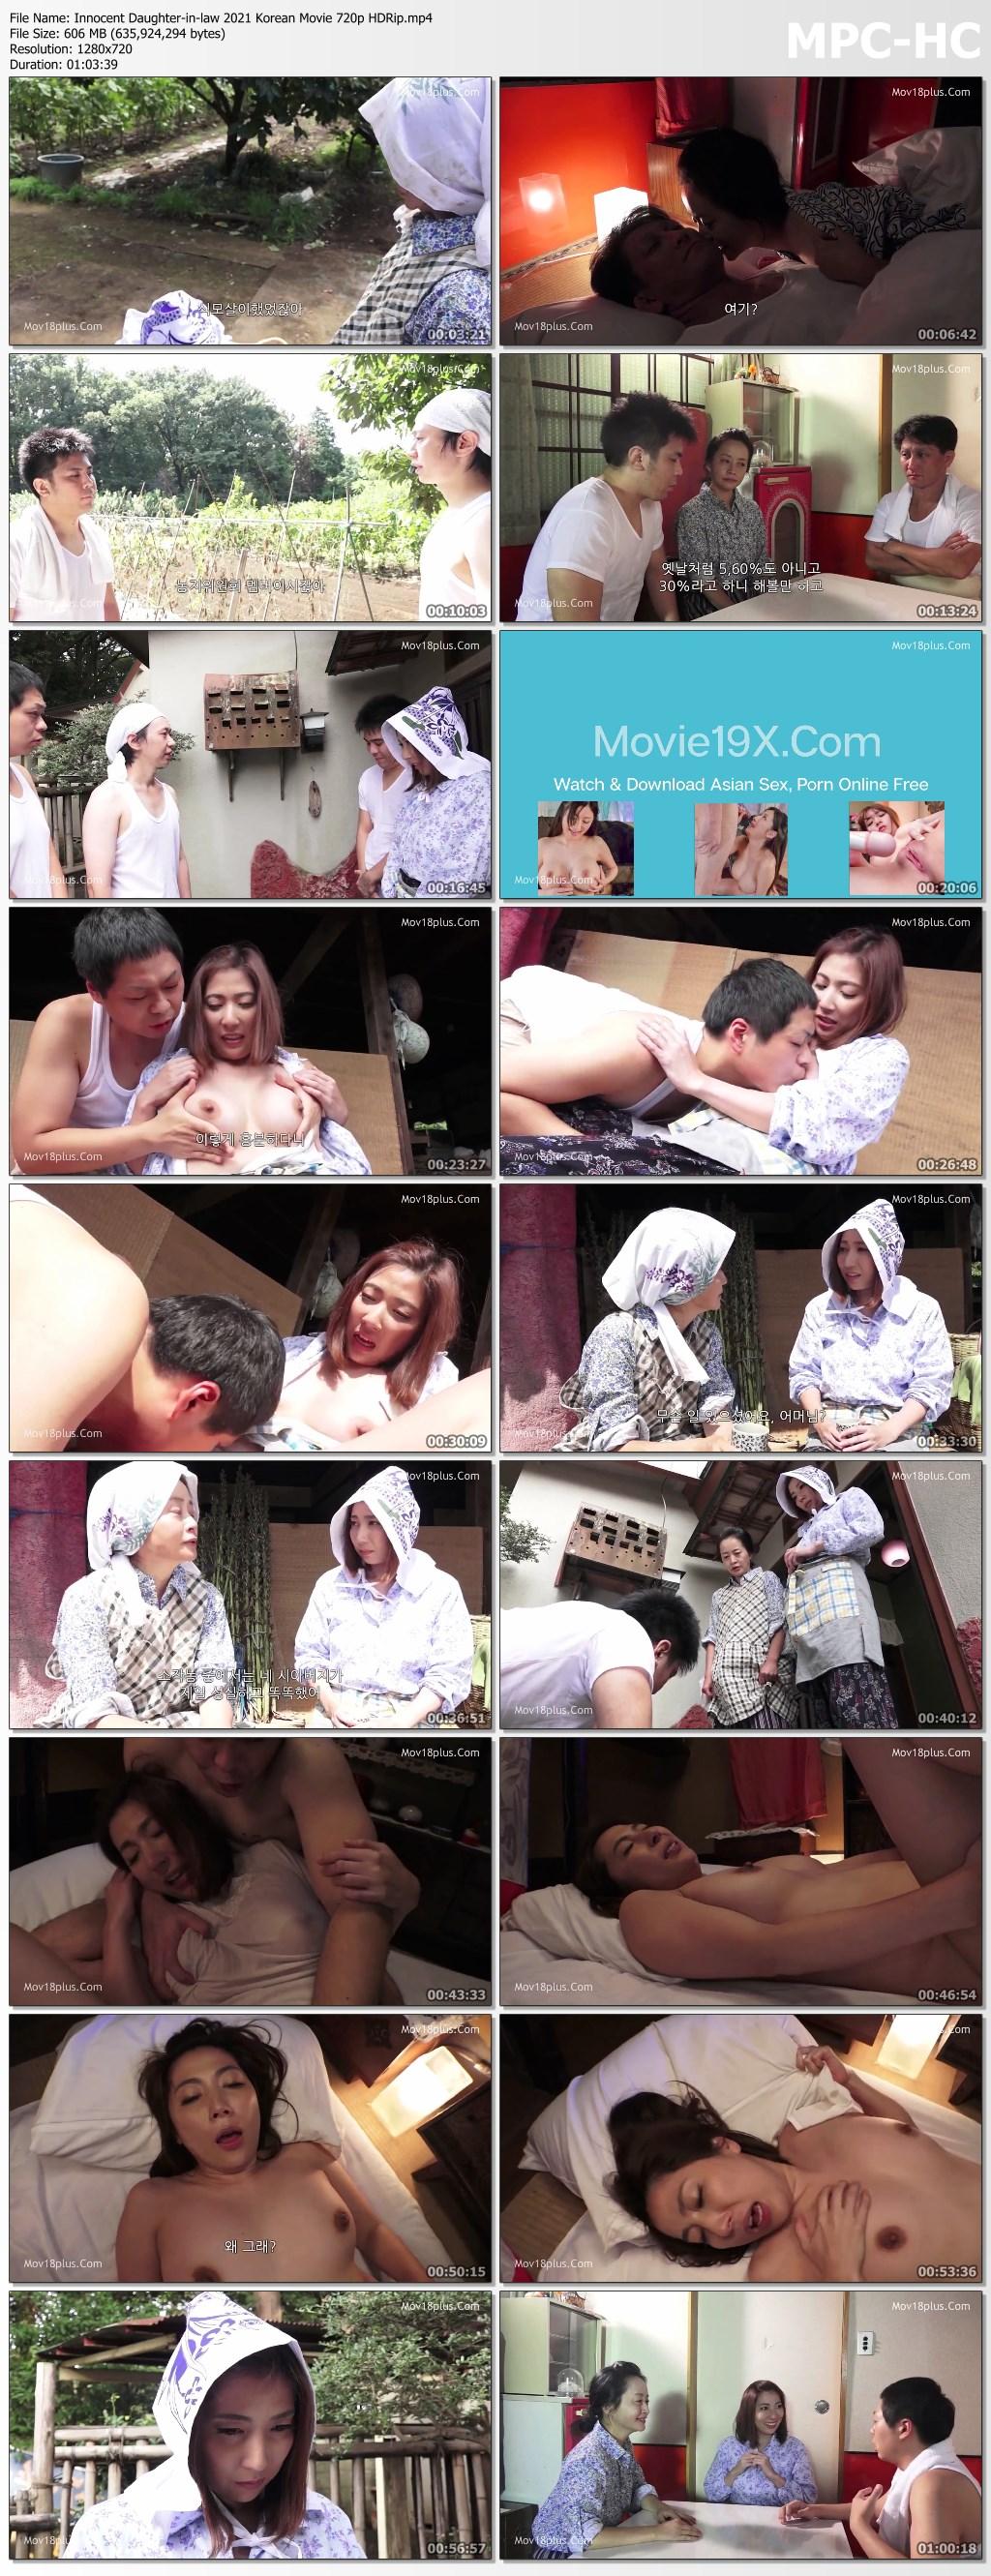 Innocent Daughter in law 2021 Korean Movie 720p HDRip.mp4 thumbs